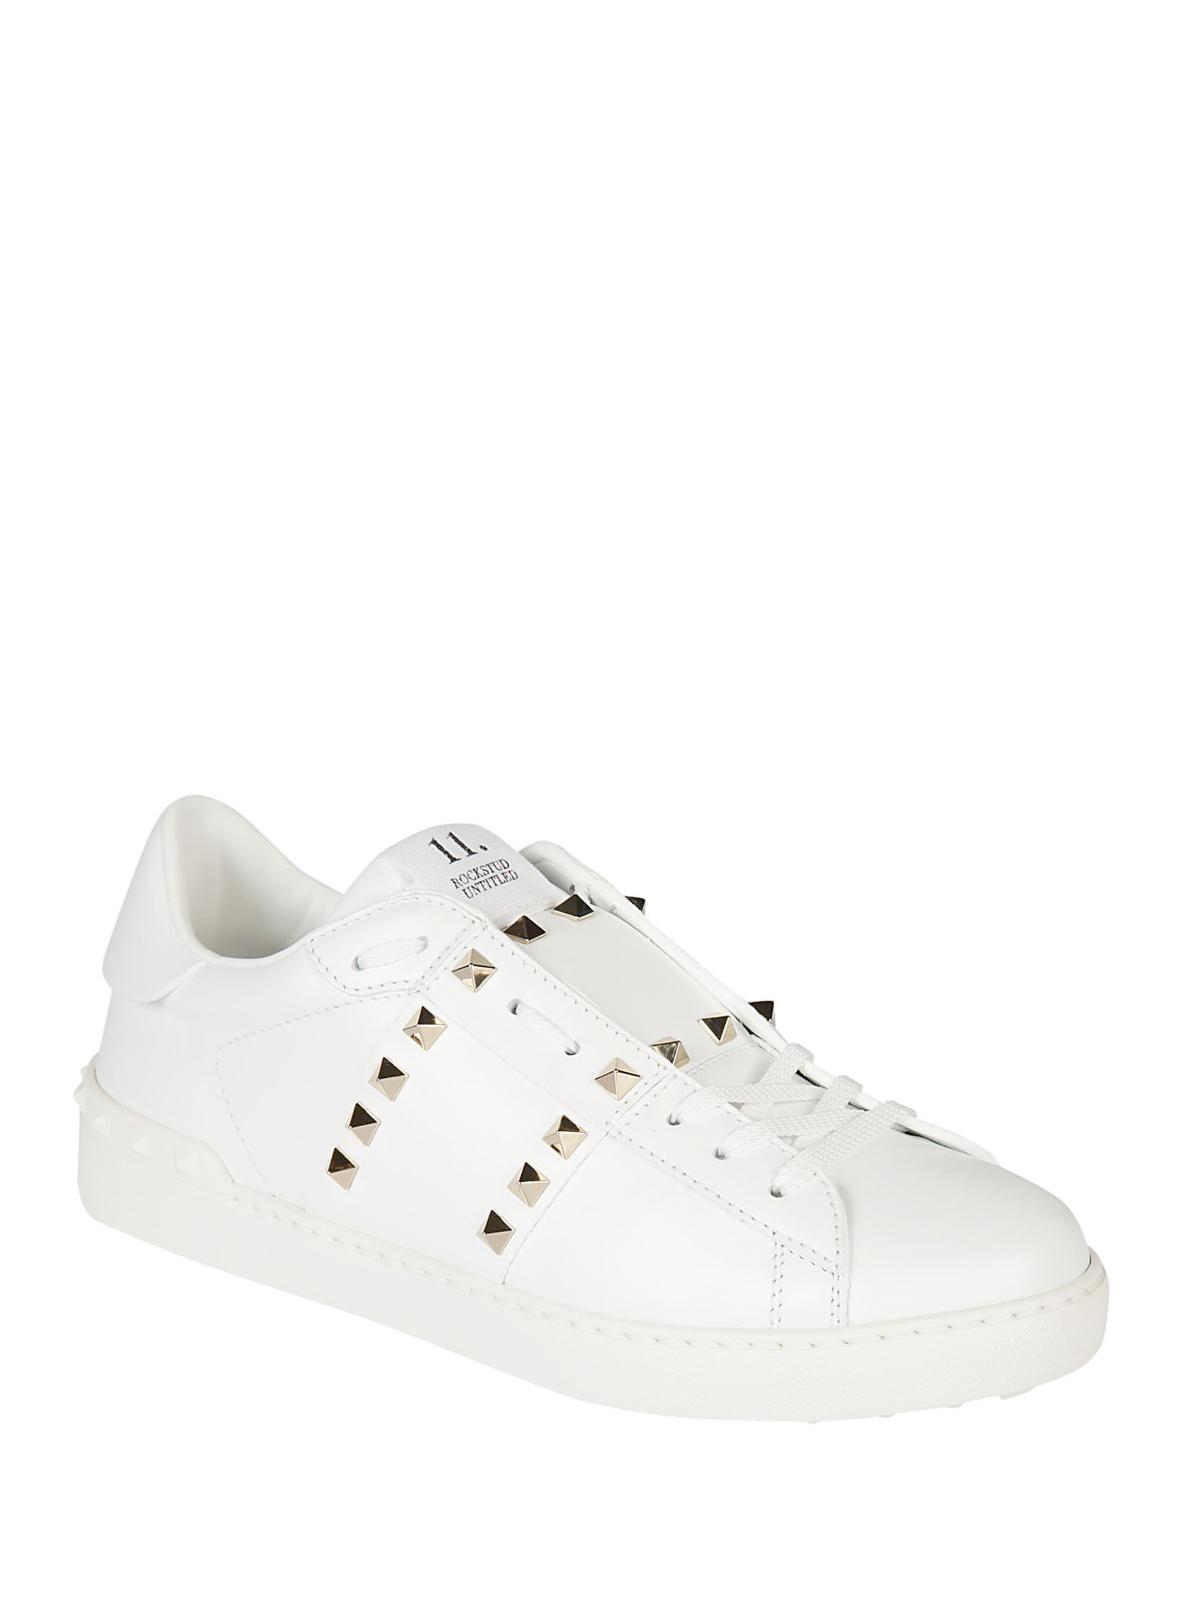 d5e0faa060fa VALENTINO GARAVANI  trainers online - 11. Rockstud Untitled sneakers